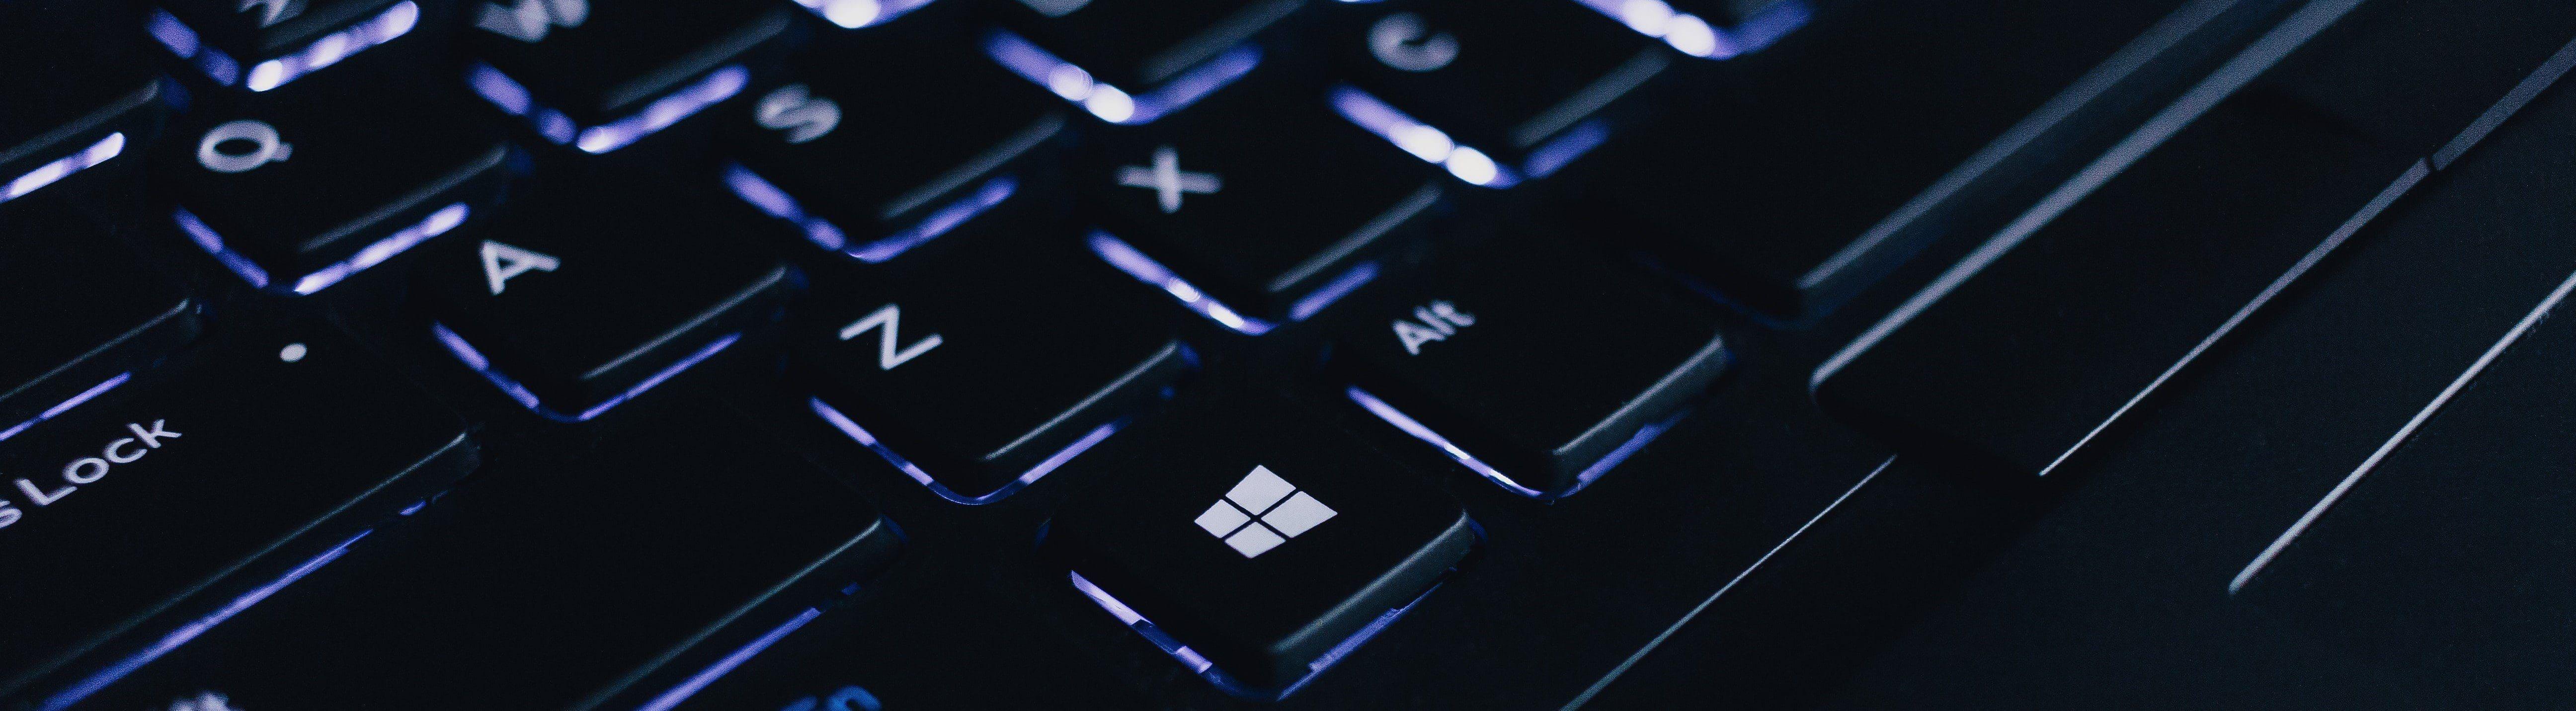 keyboard glowing